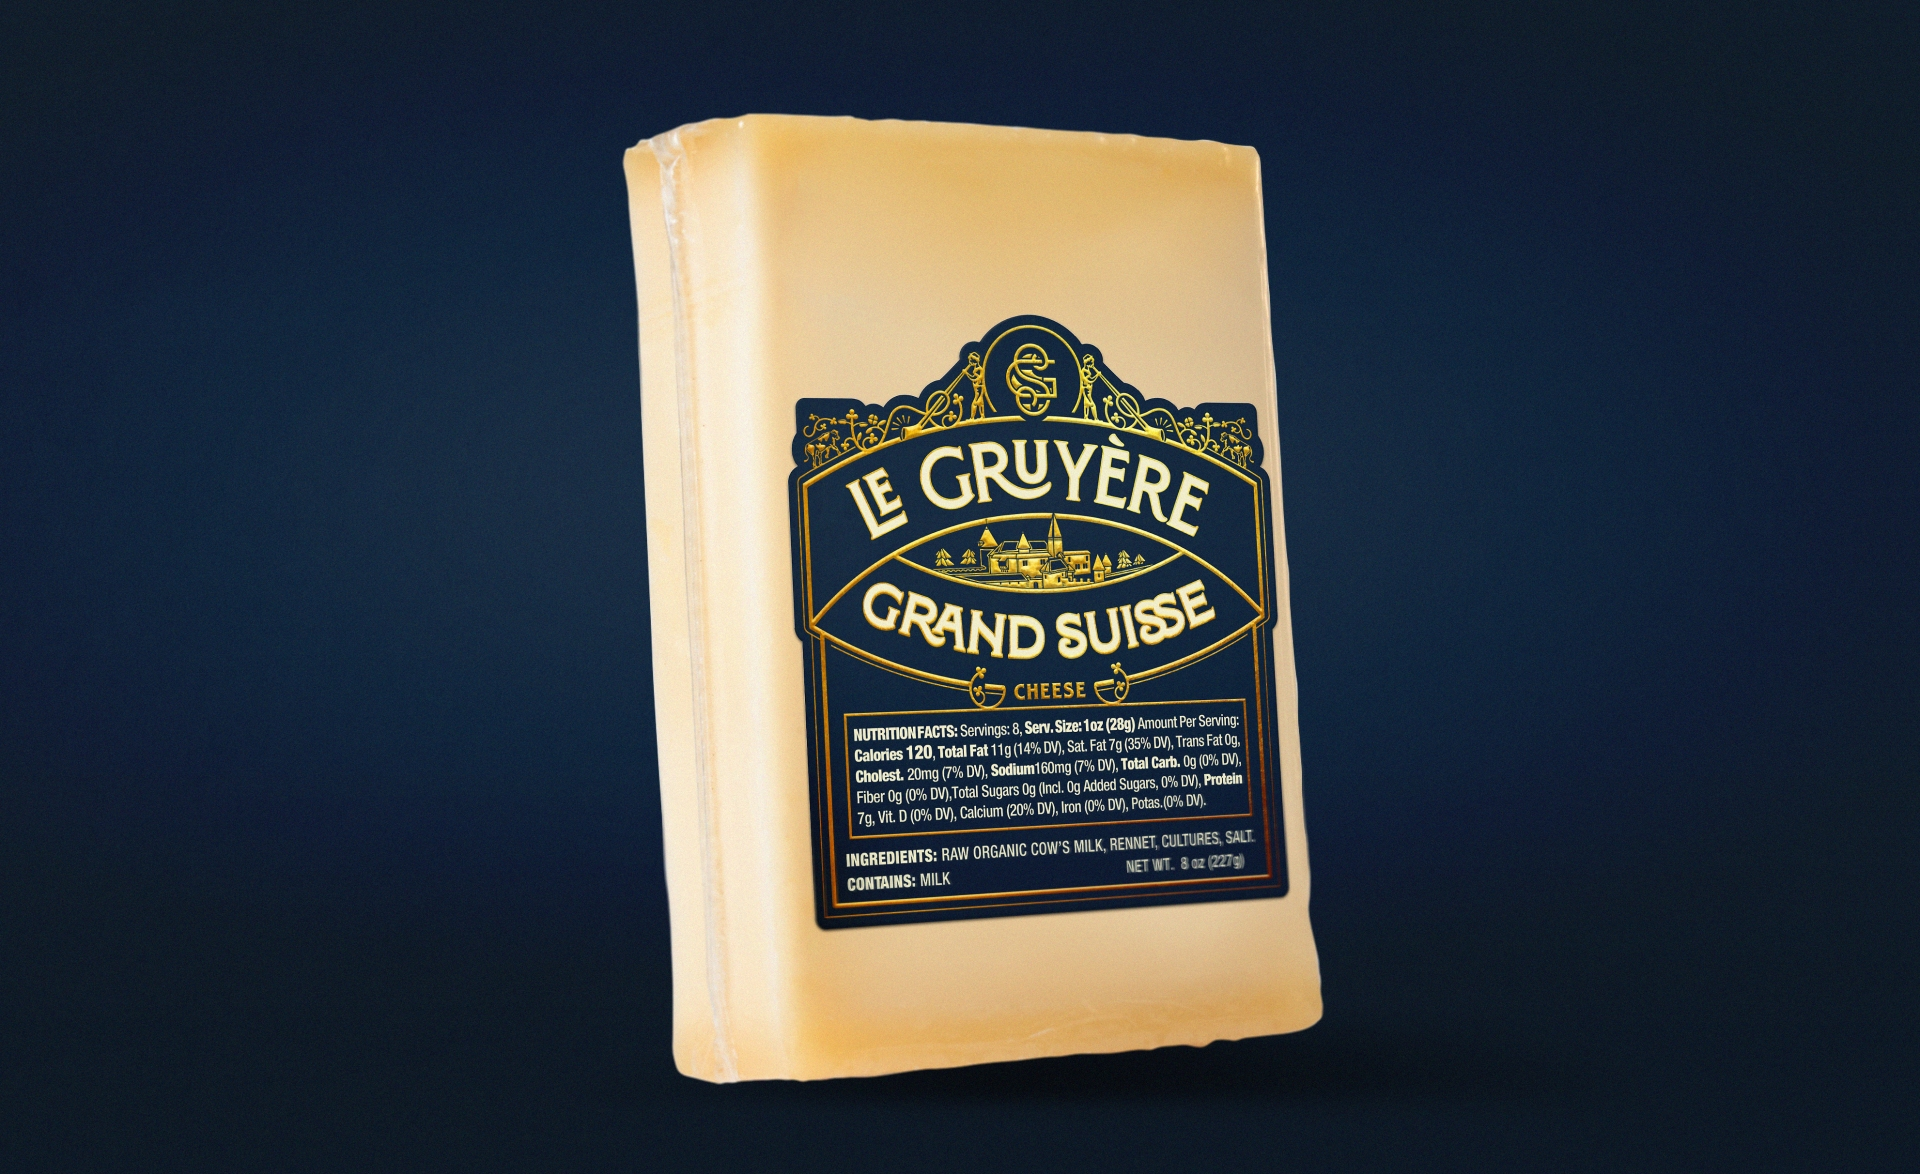 label-cheese-side-gruyere-preview-grand-suisse-close-zeki-michael-design-branding-studio-packaging-red copy